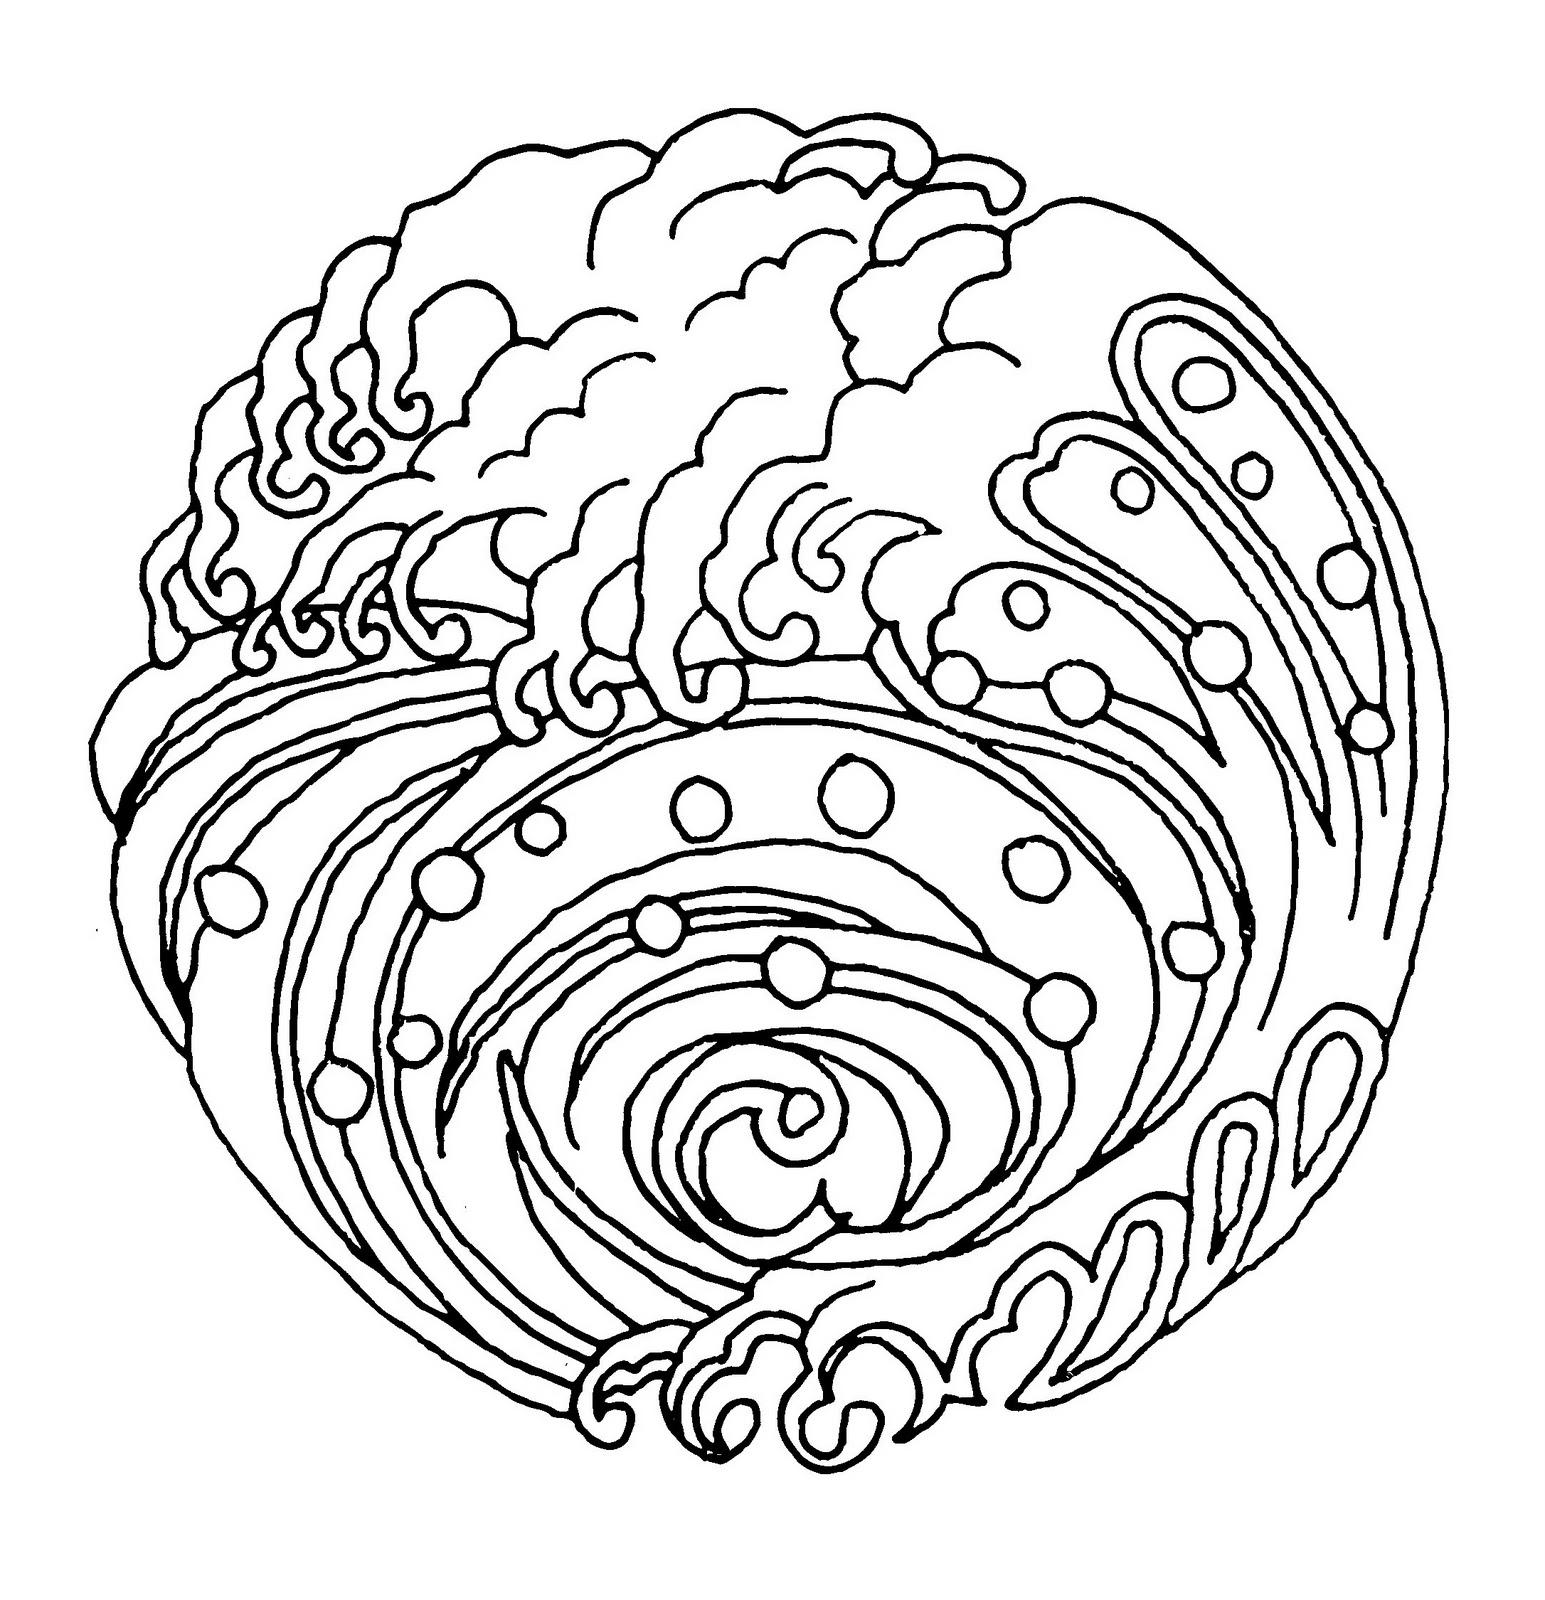 ocean mandalas coloring pages - photo #5